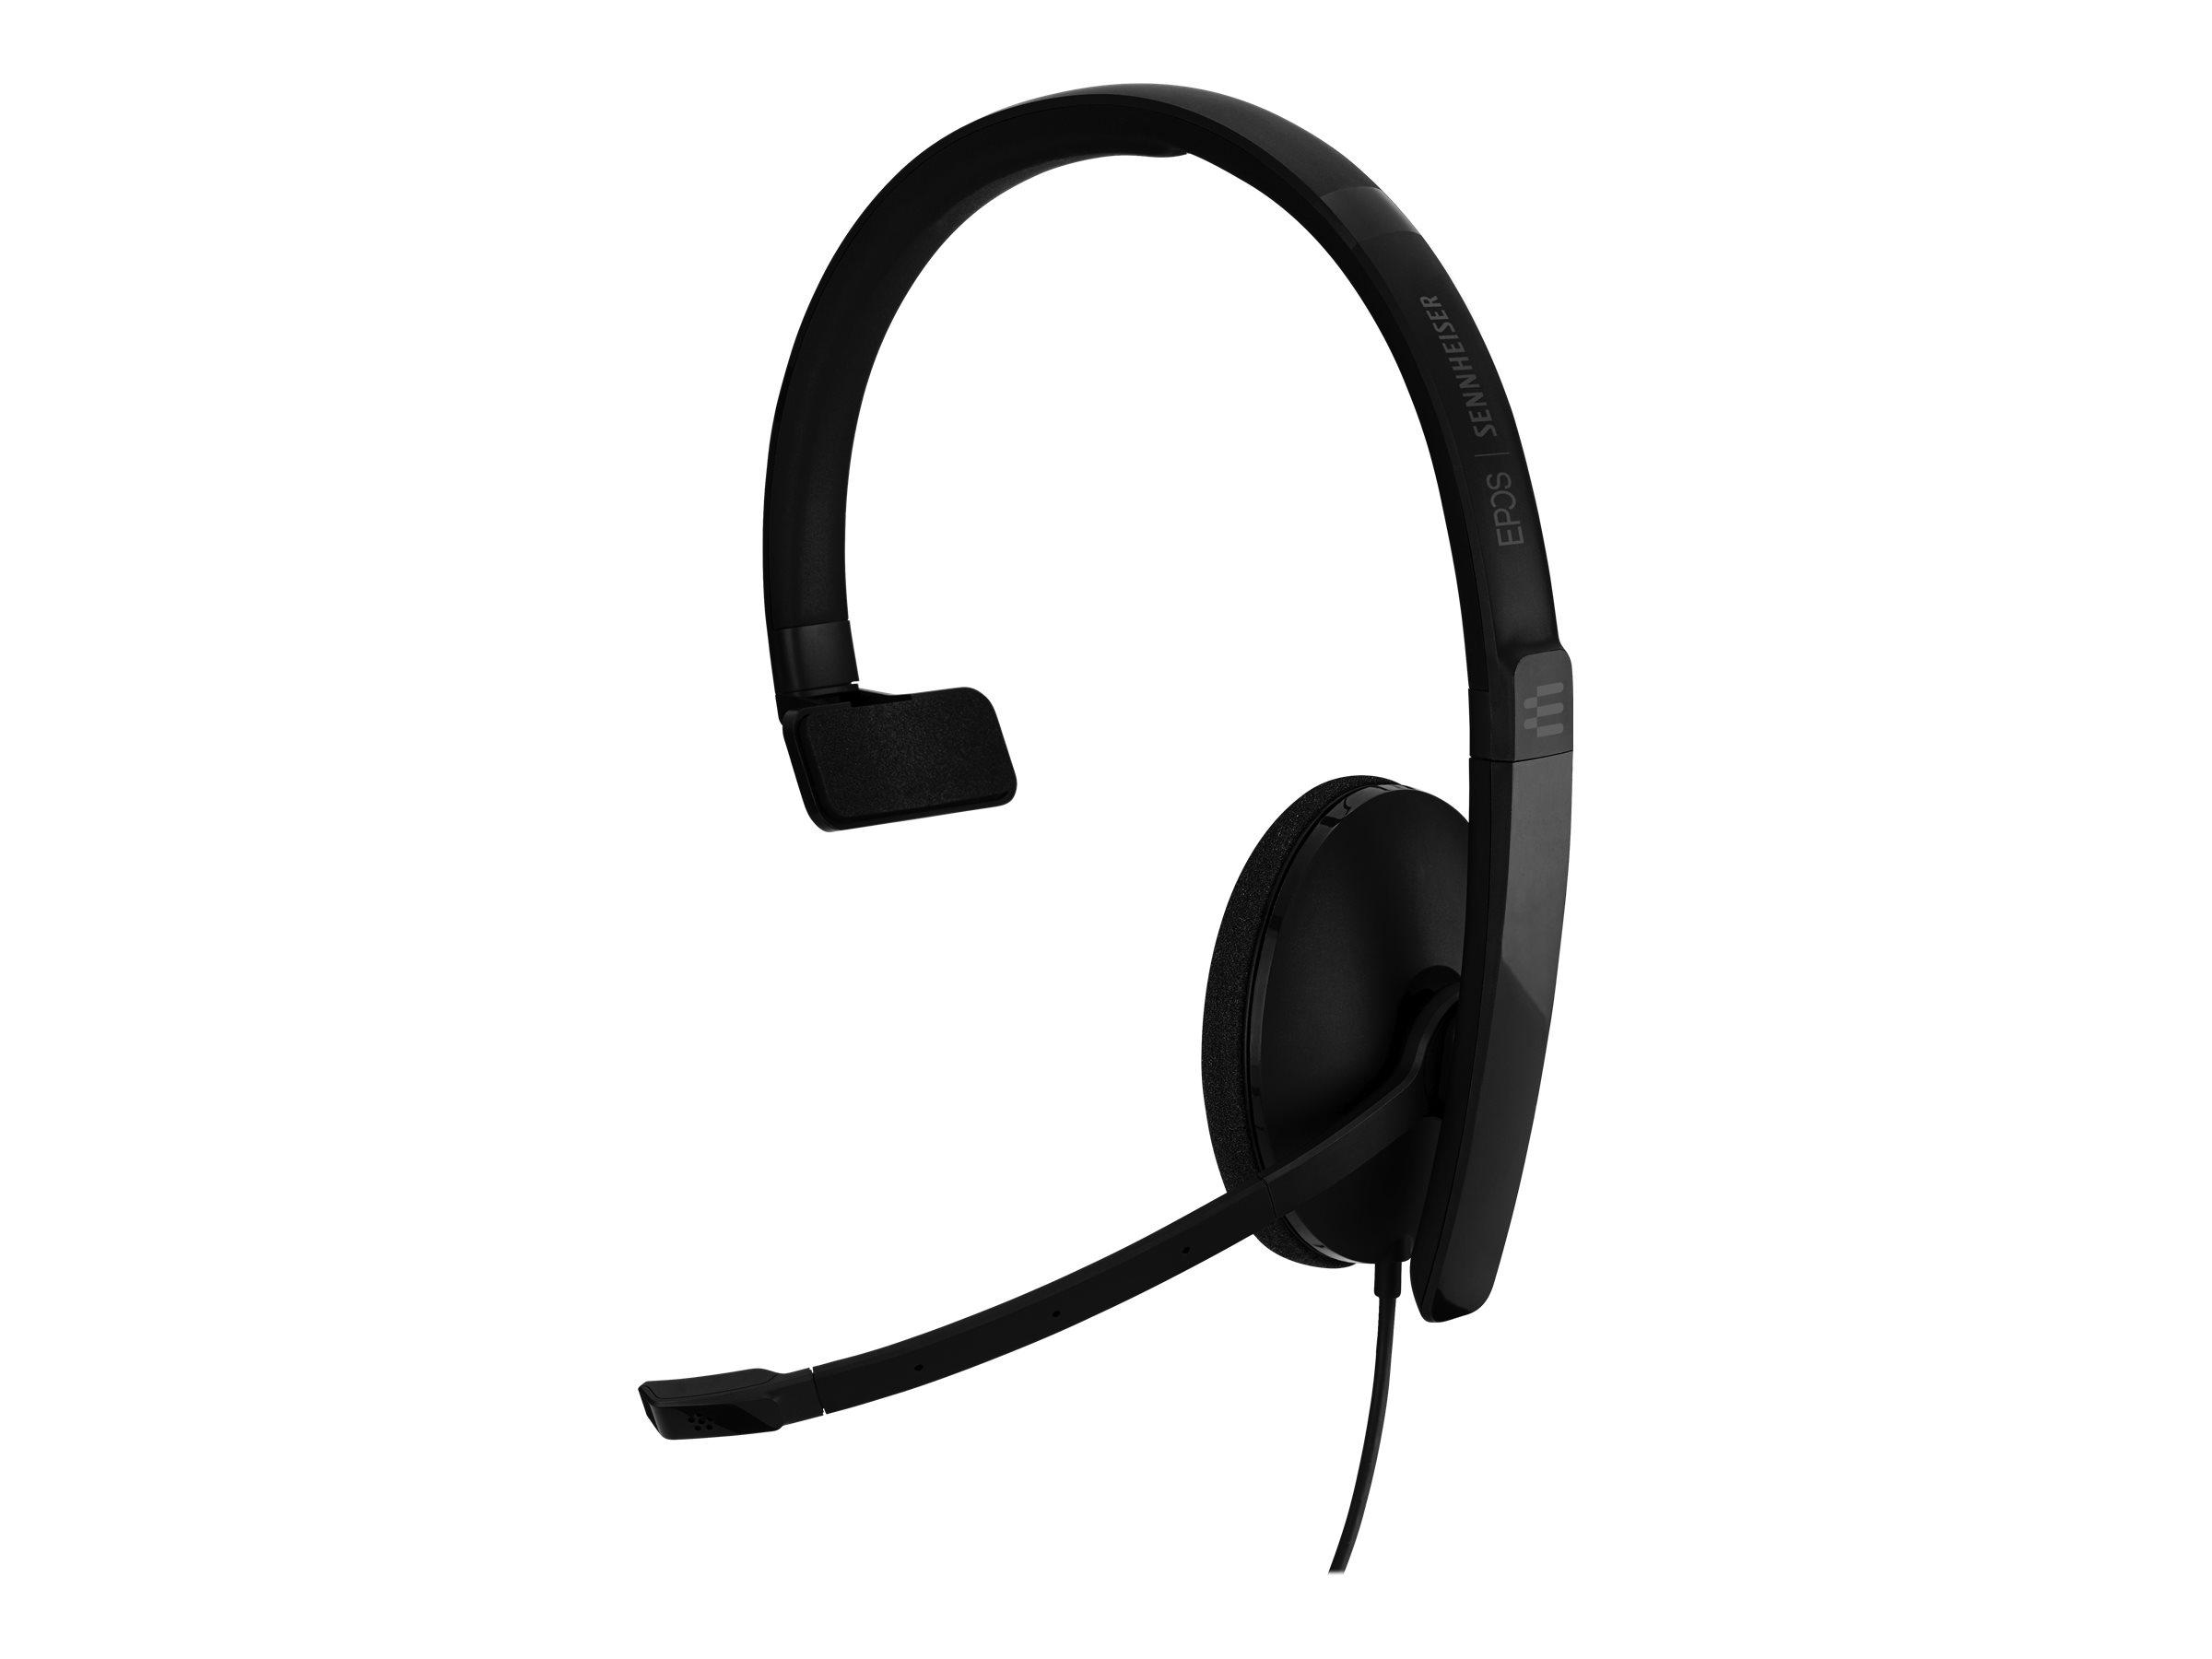 EPOS I SENNHEISER ADAPT 130T USB II - ADAPT 100 Series - Headset - On-Ear - kabelgebunden - USB-A